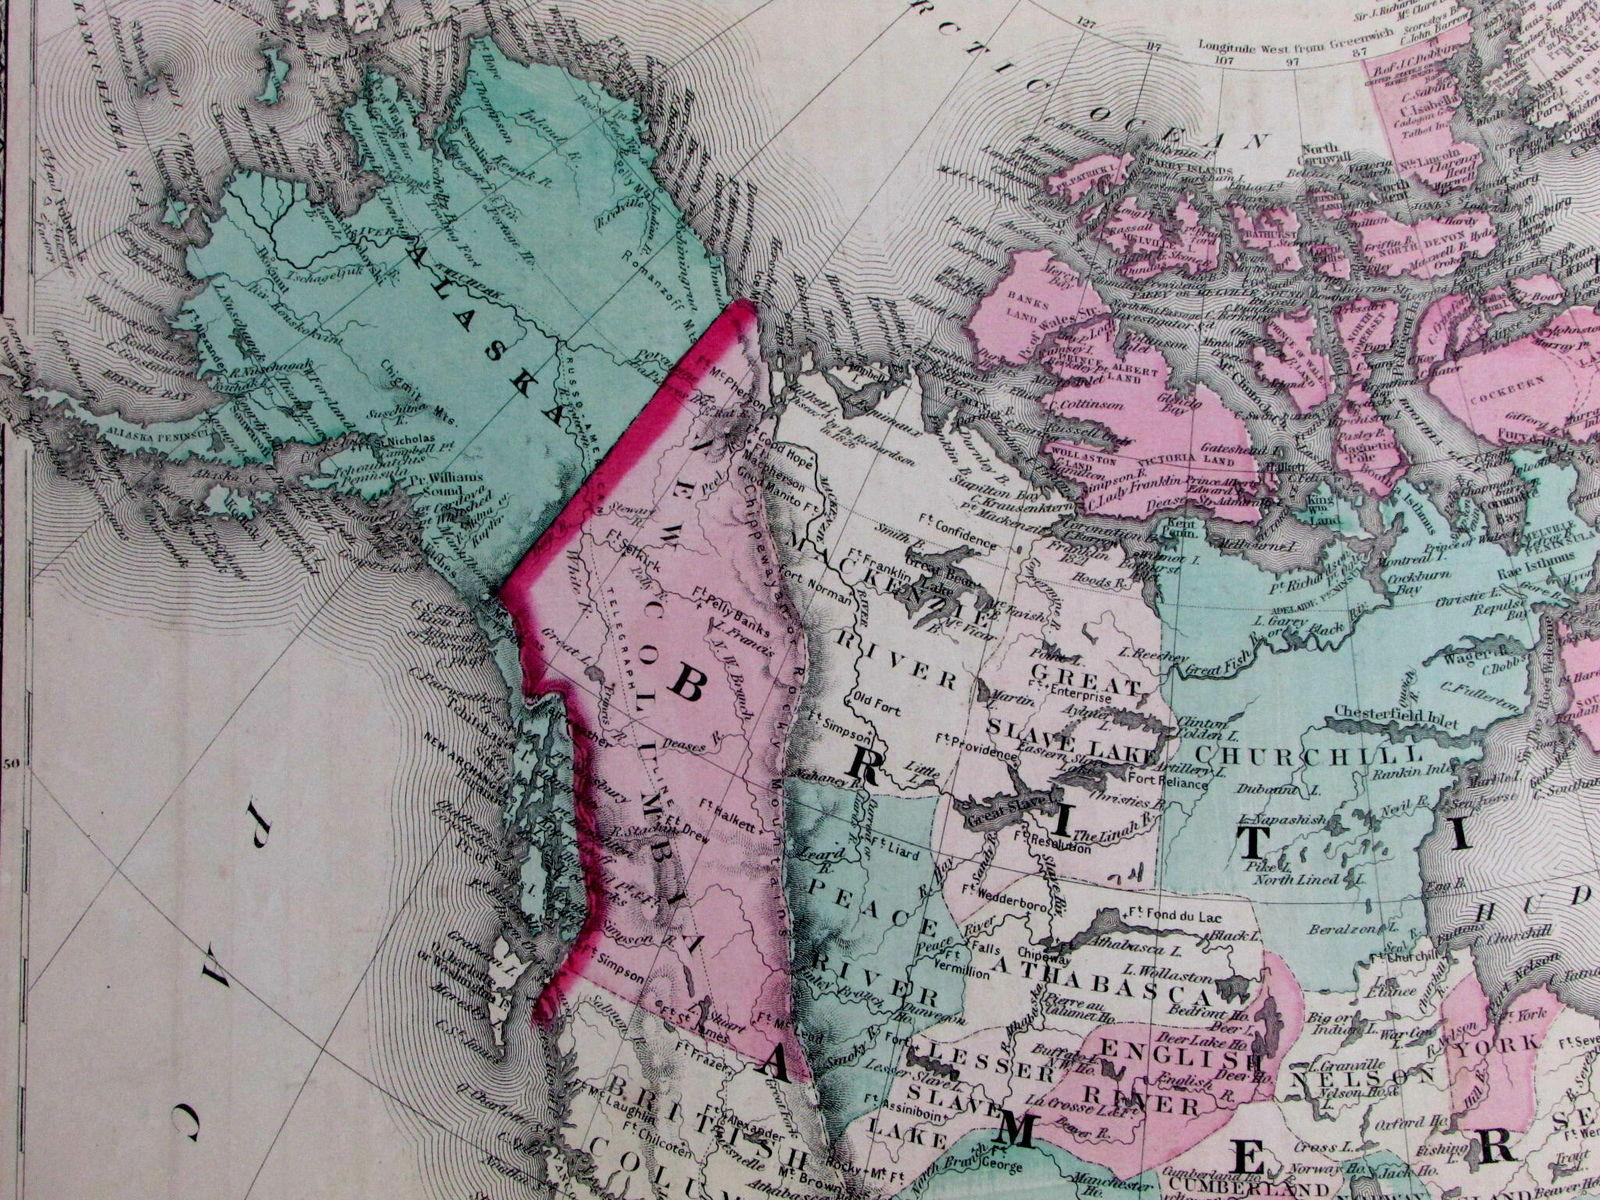 Map Of North America And Hawaii.North America Sandwich Islands Hawaii Alaska Scarce 1867 Large Old